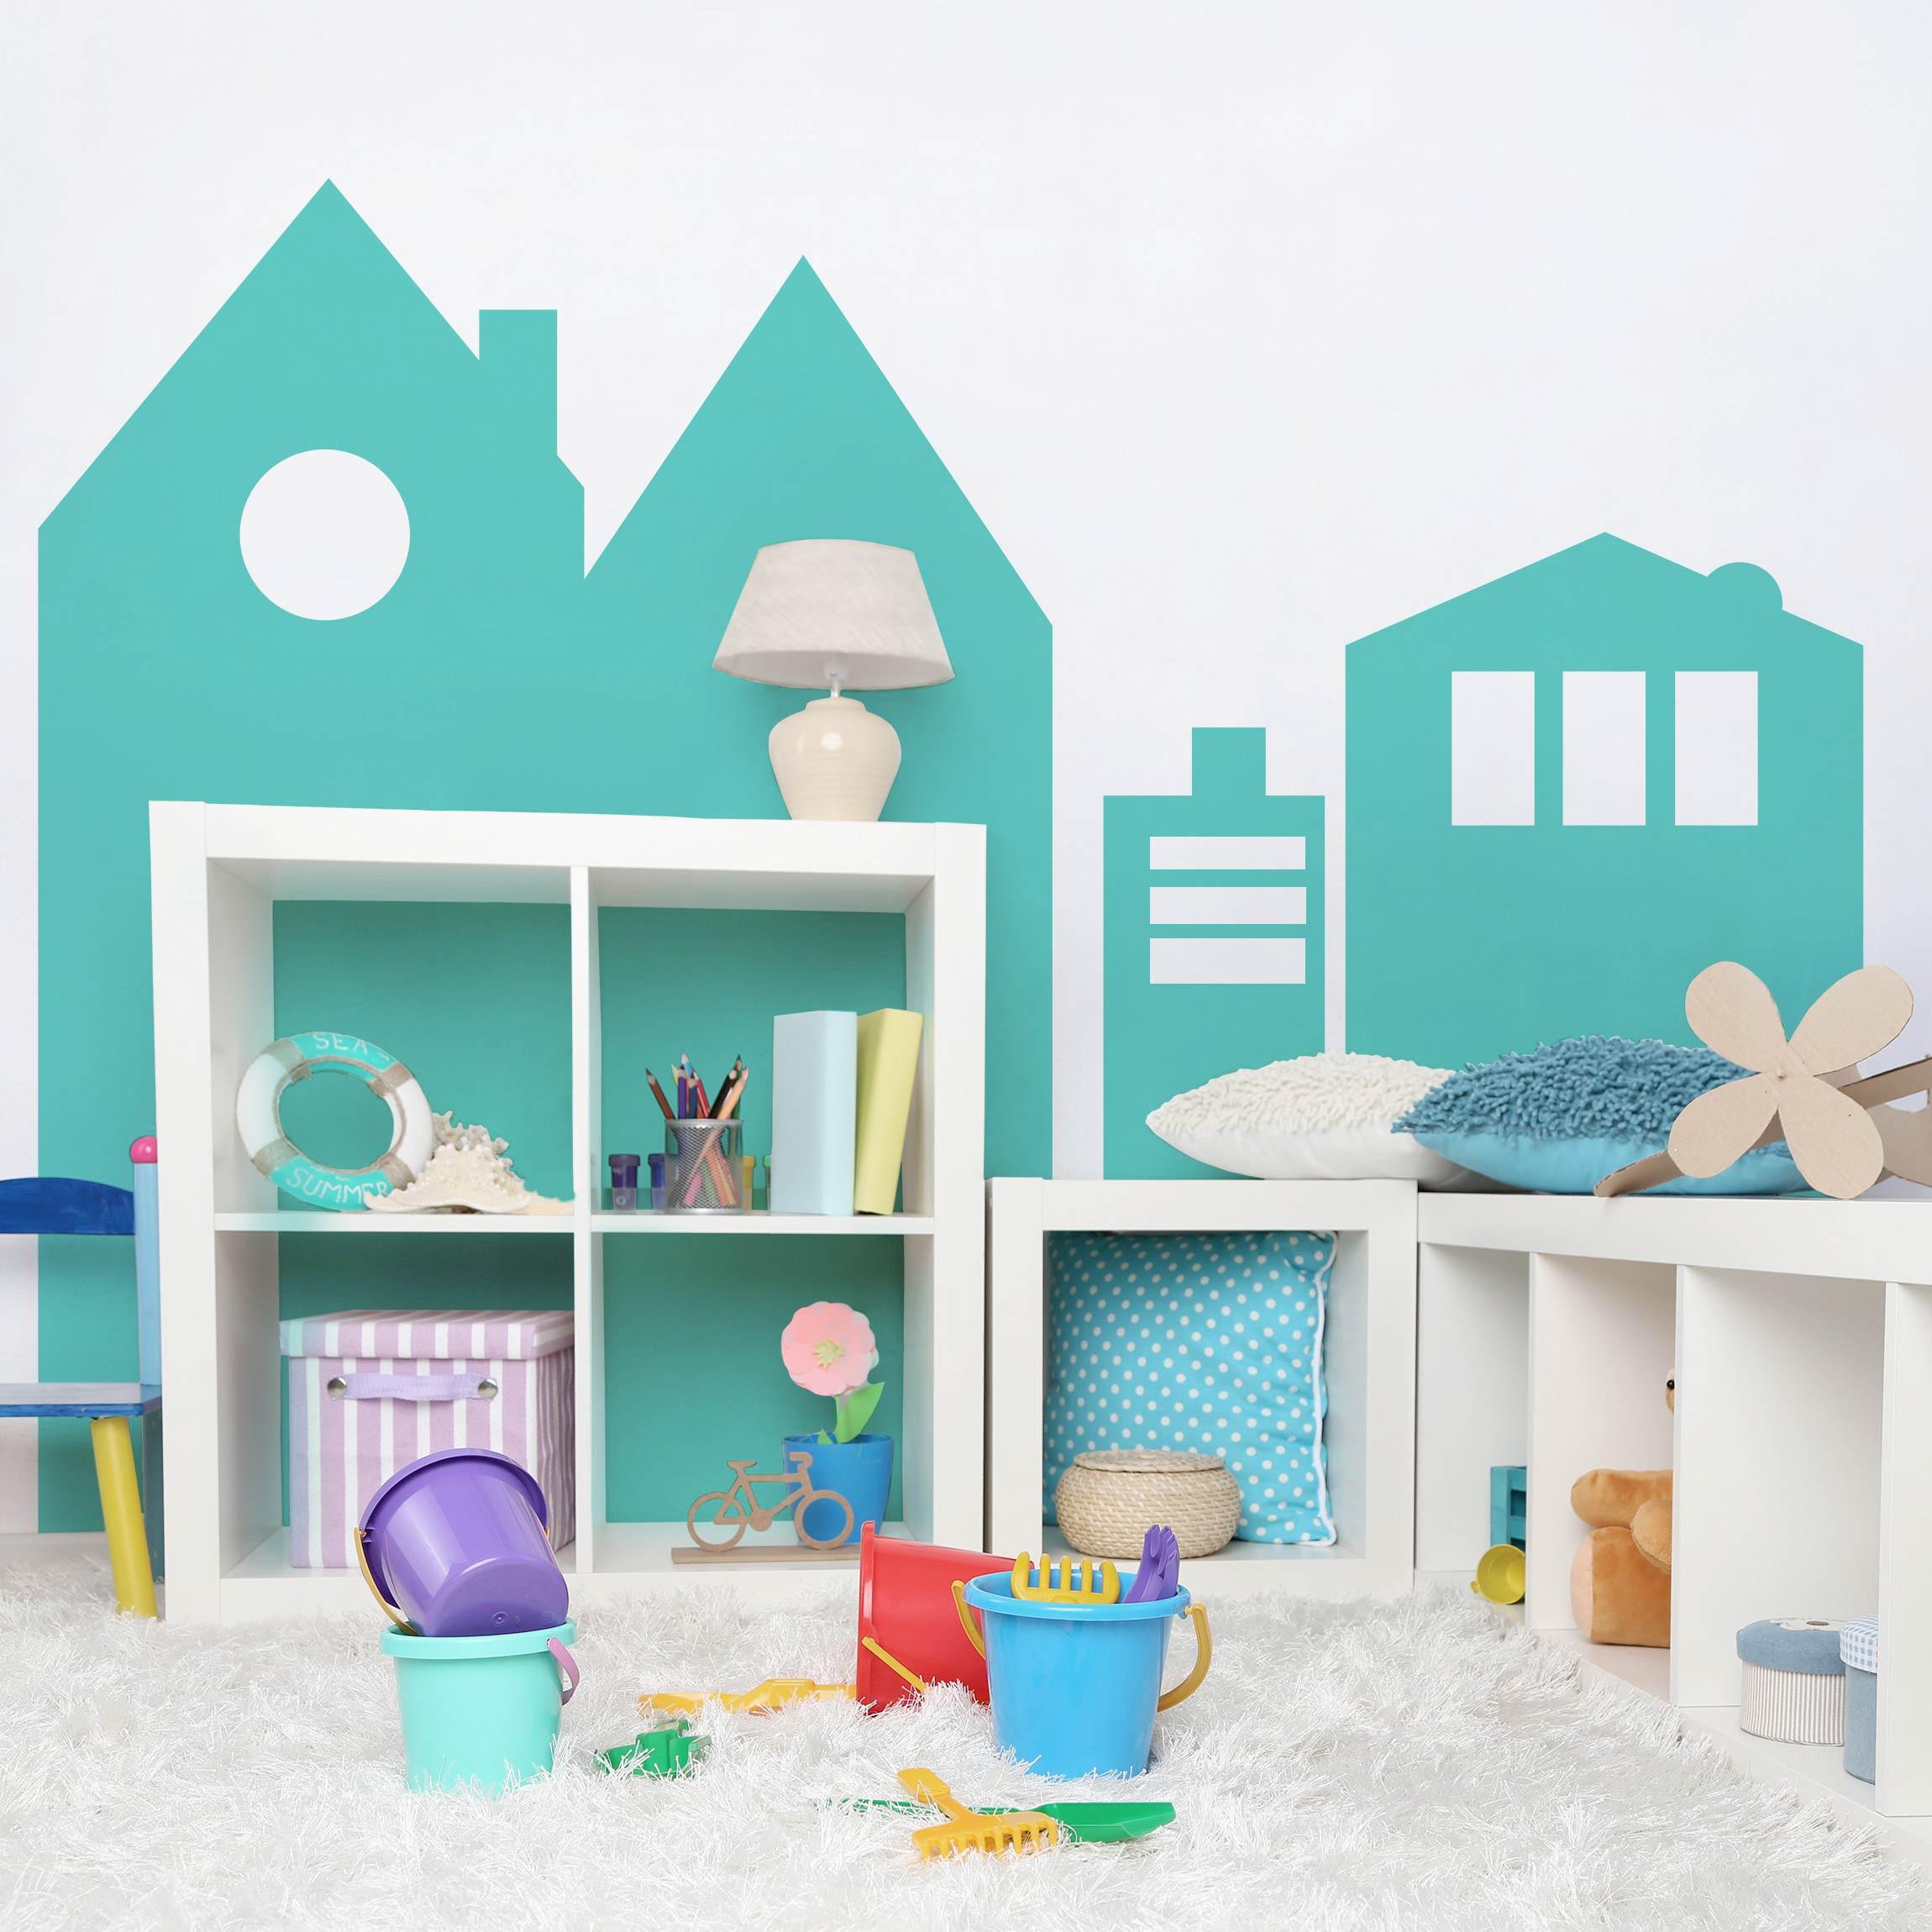 Carta adesiva per mobili colour turquoise - Carta adesiva colorata per mobili ...